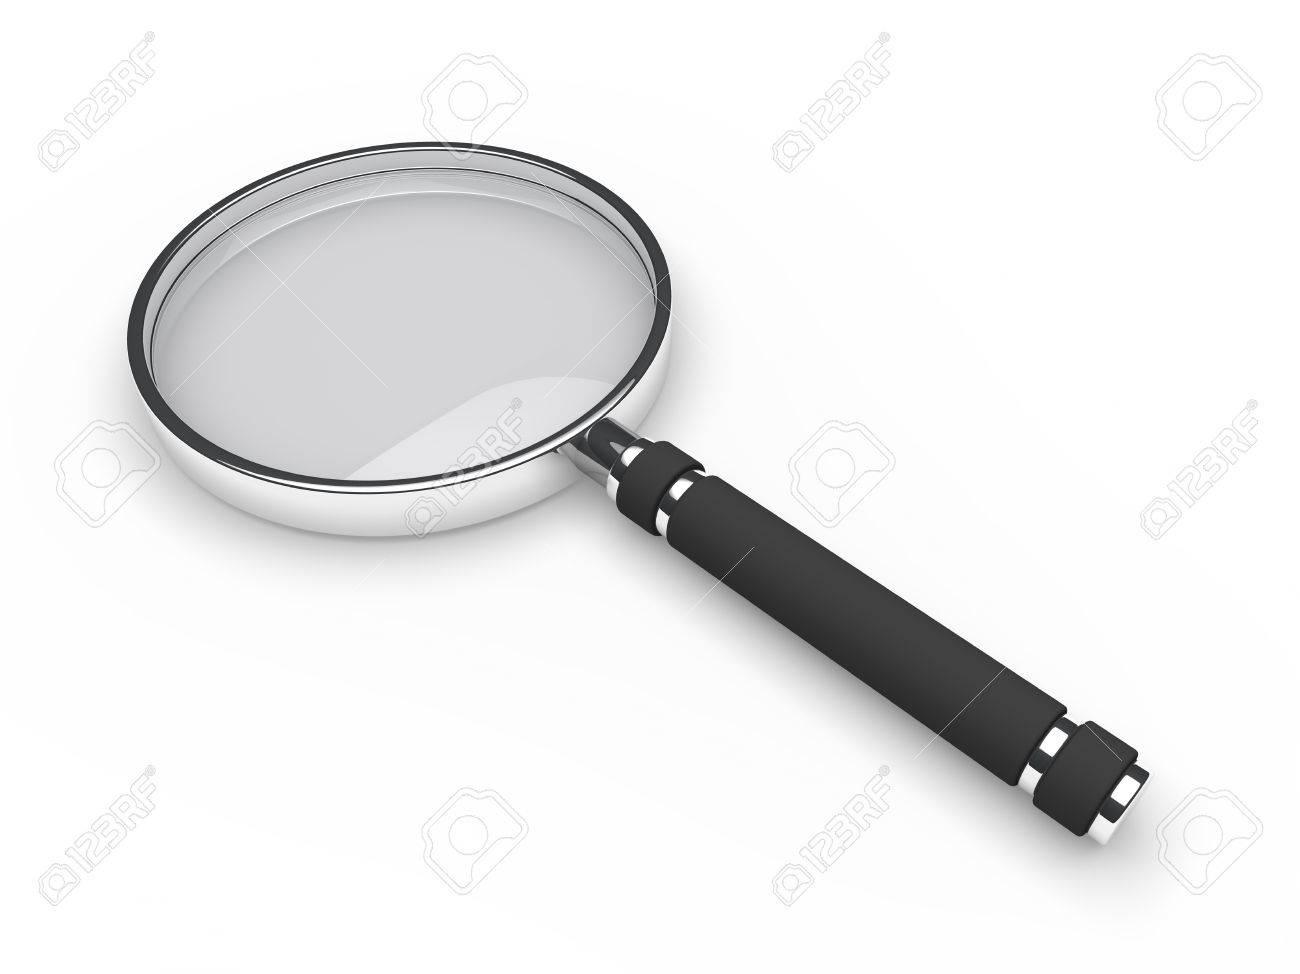 f2a2951655 Cristal 3D vista de zoom de búsqueda de lente de aumento Foto de archivo -  10417088